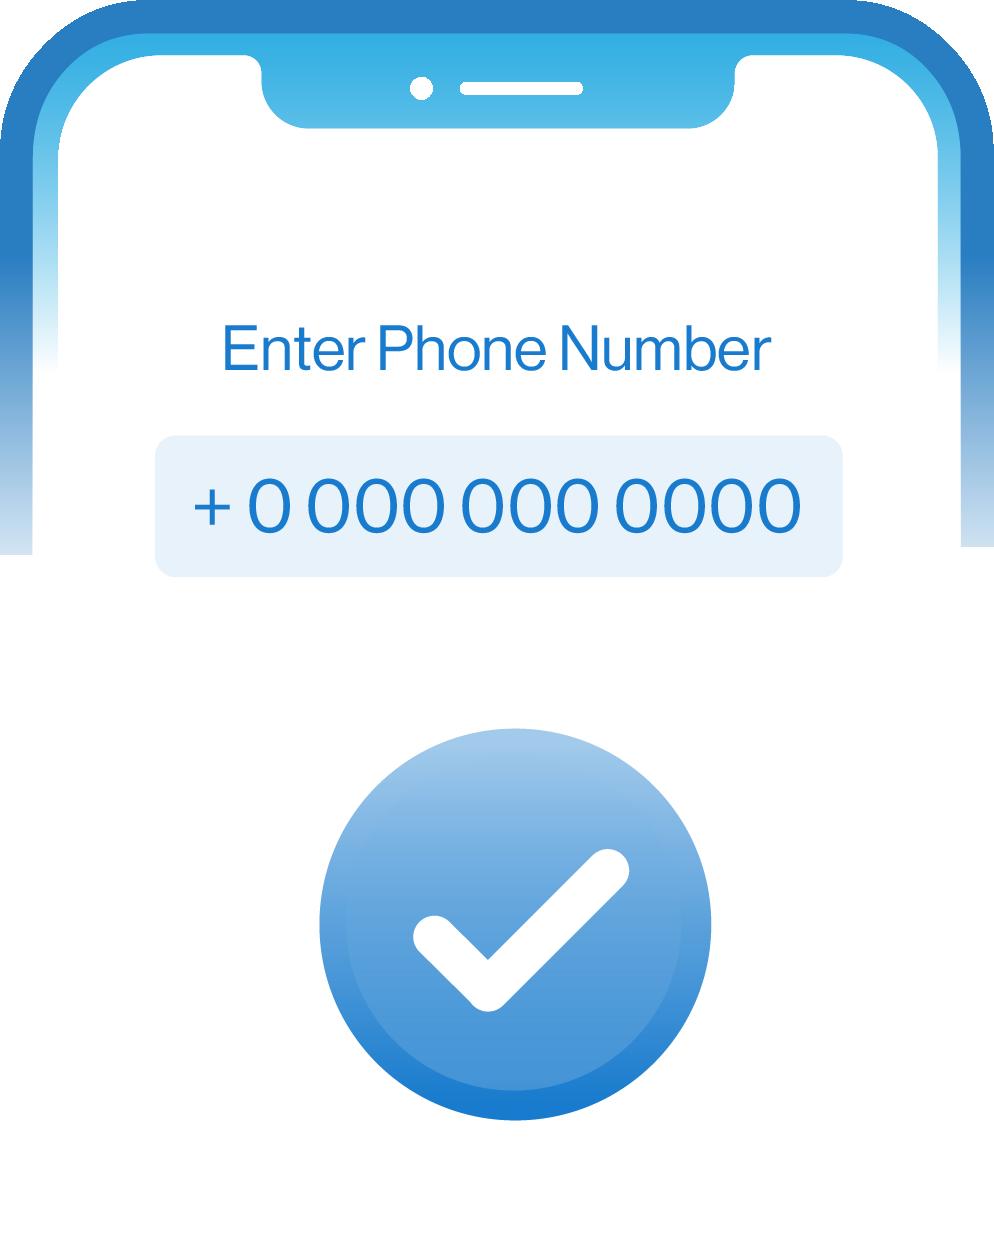 Streamline Account Registration